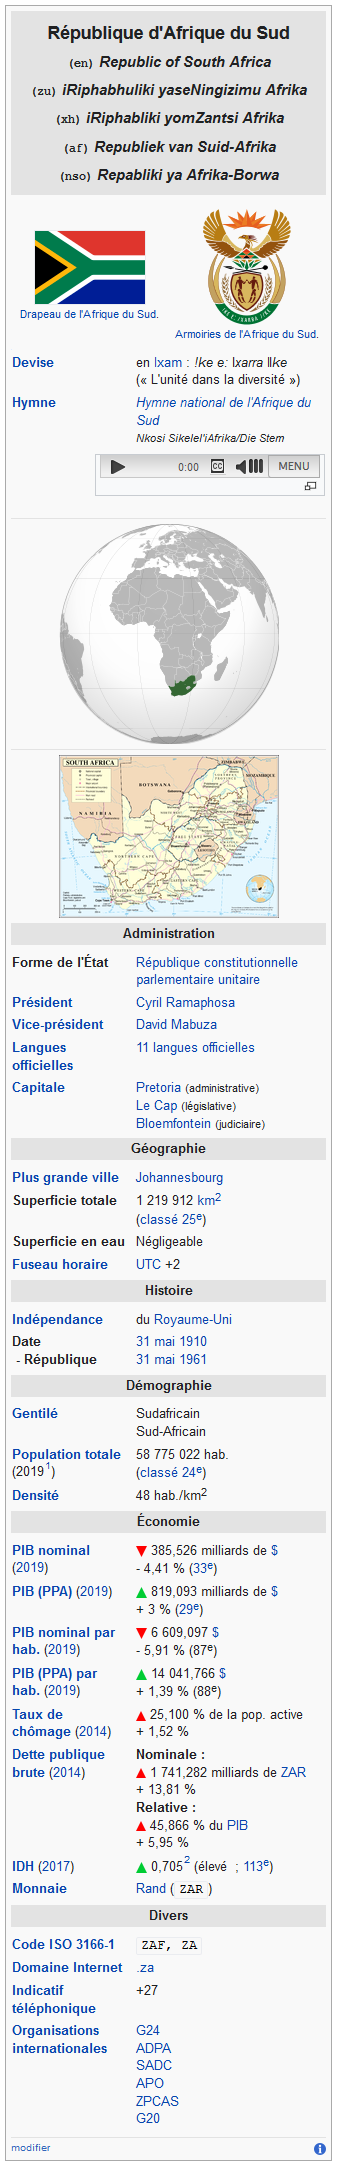 Screenshot_2020-05-05_Afrique_du_Sud_—